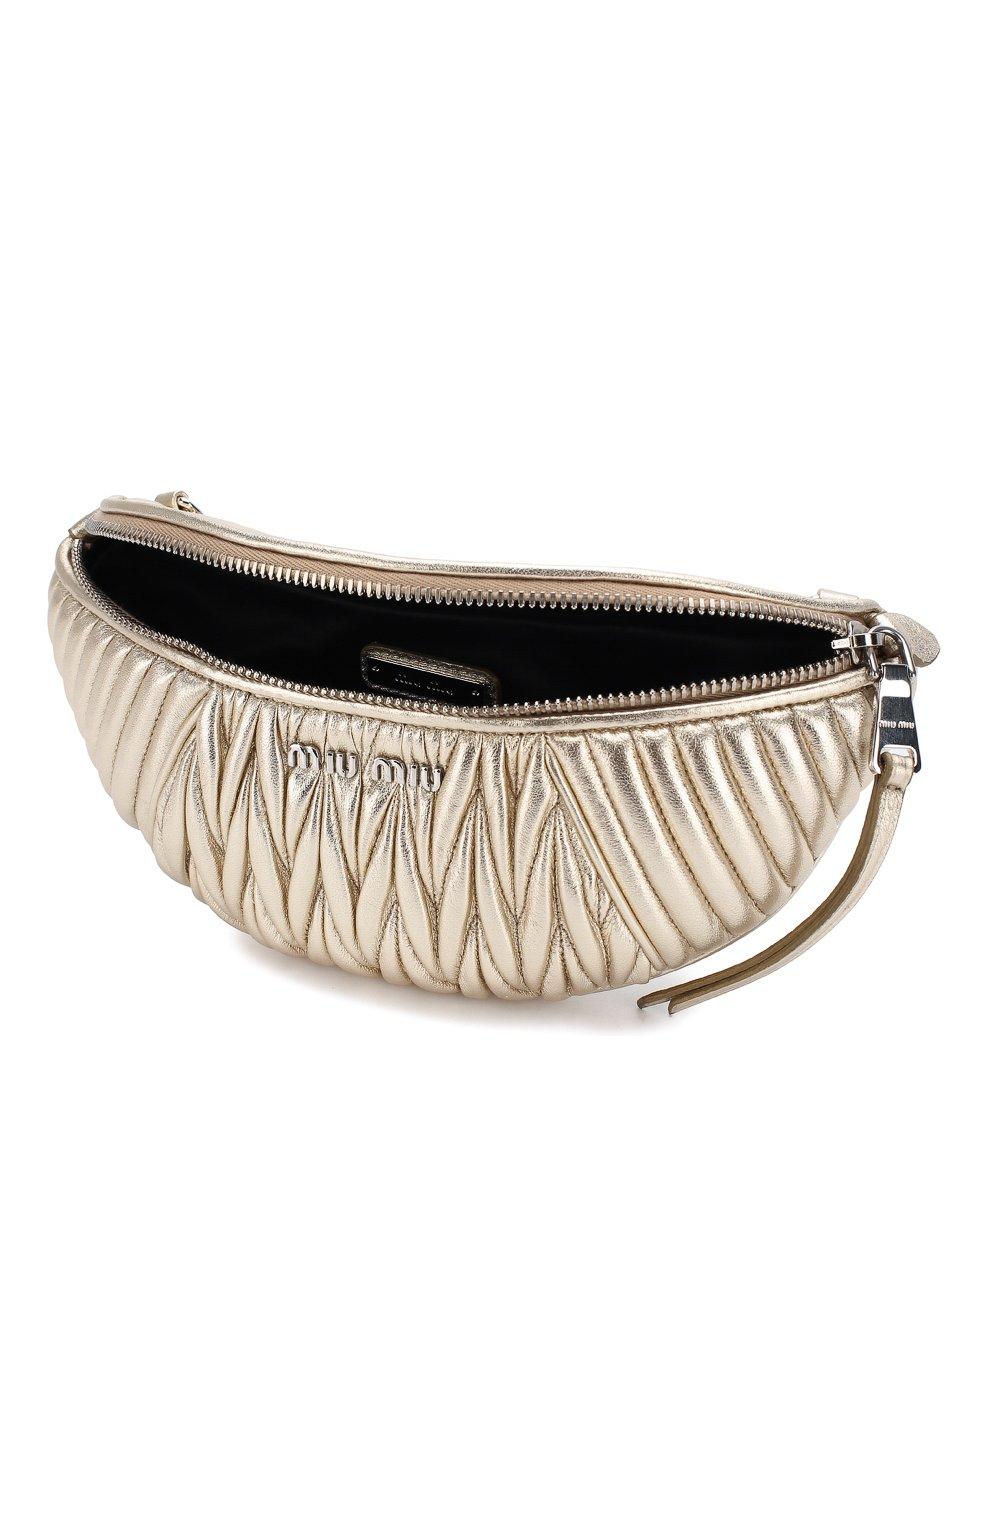 Женская поясная сумка  MIU MIU серебряного цвета, арт. 5BL010-N88-F0PLI-OOO | Фото 4